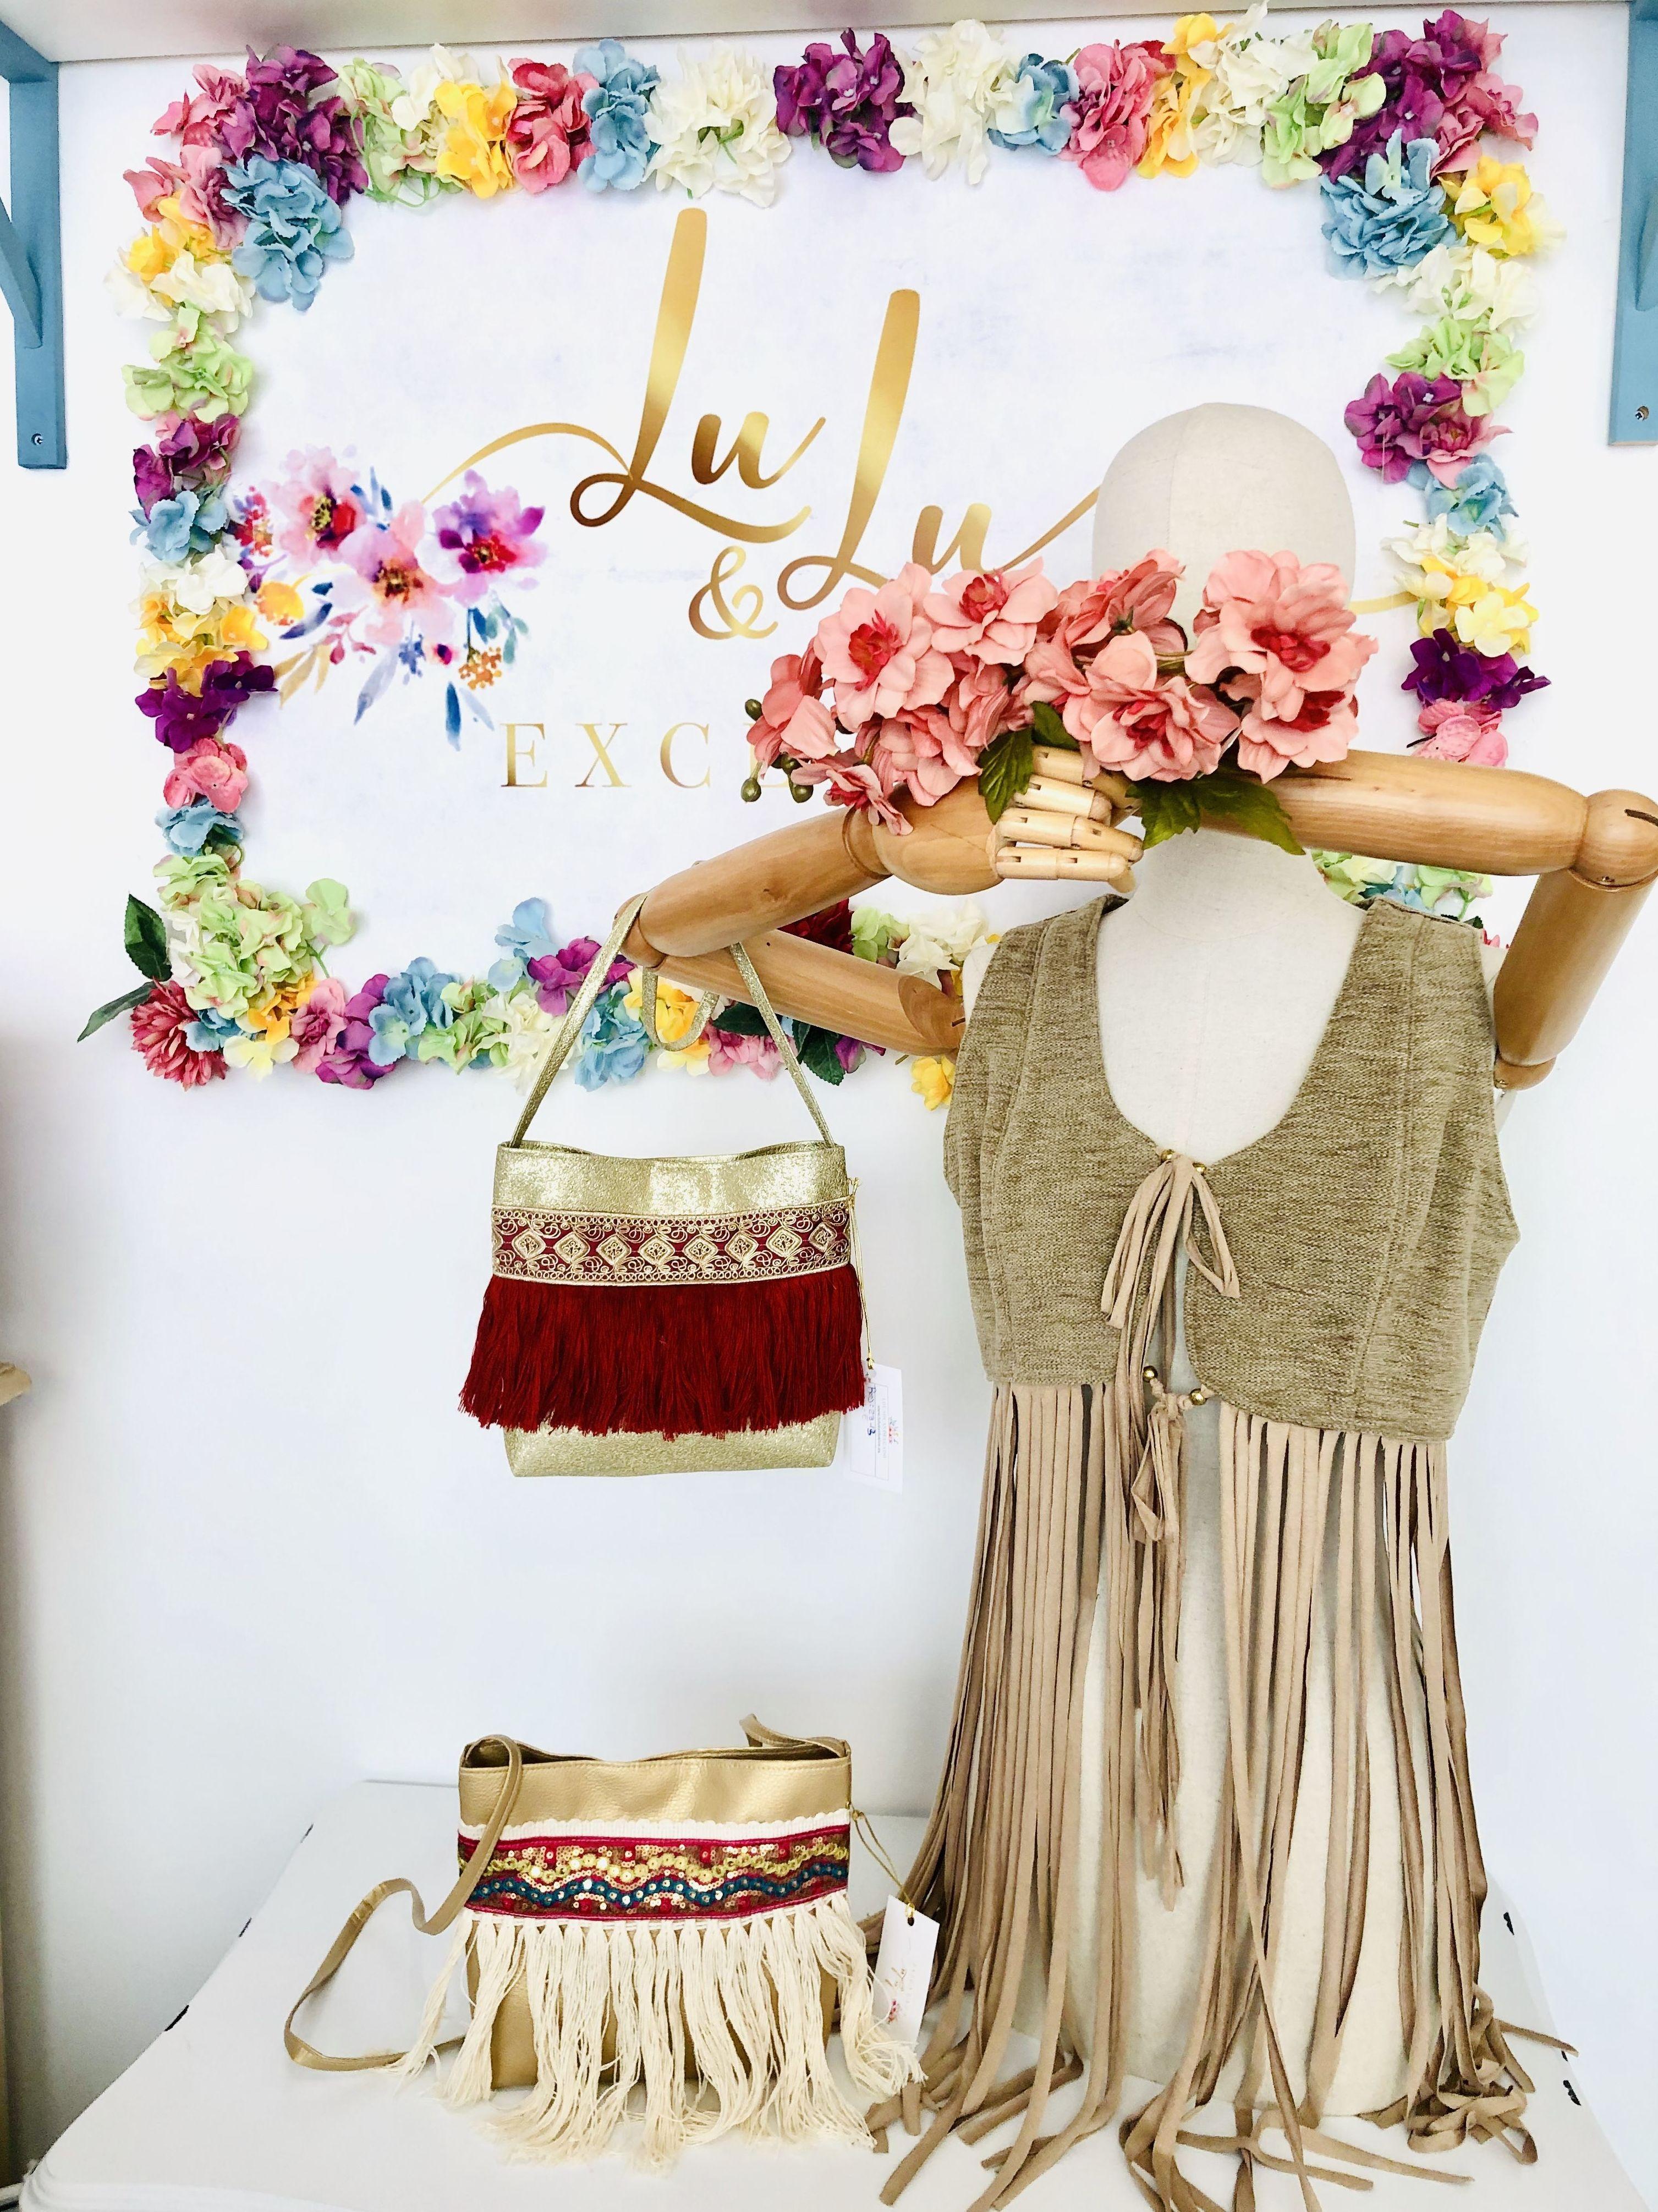 Foto 37 de Fashion accessories en  | Lu & Lu Exclusive